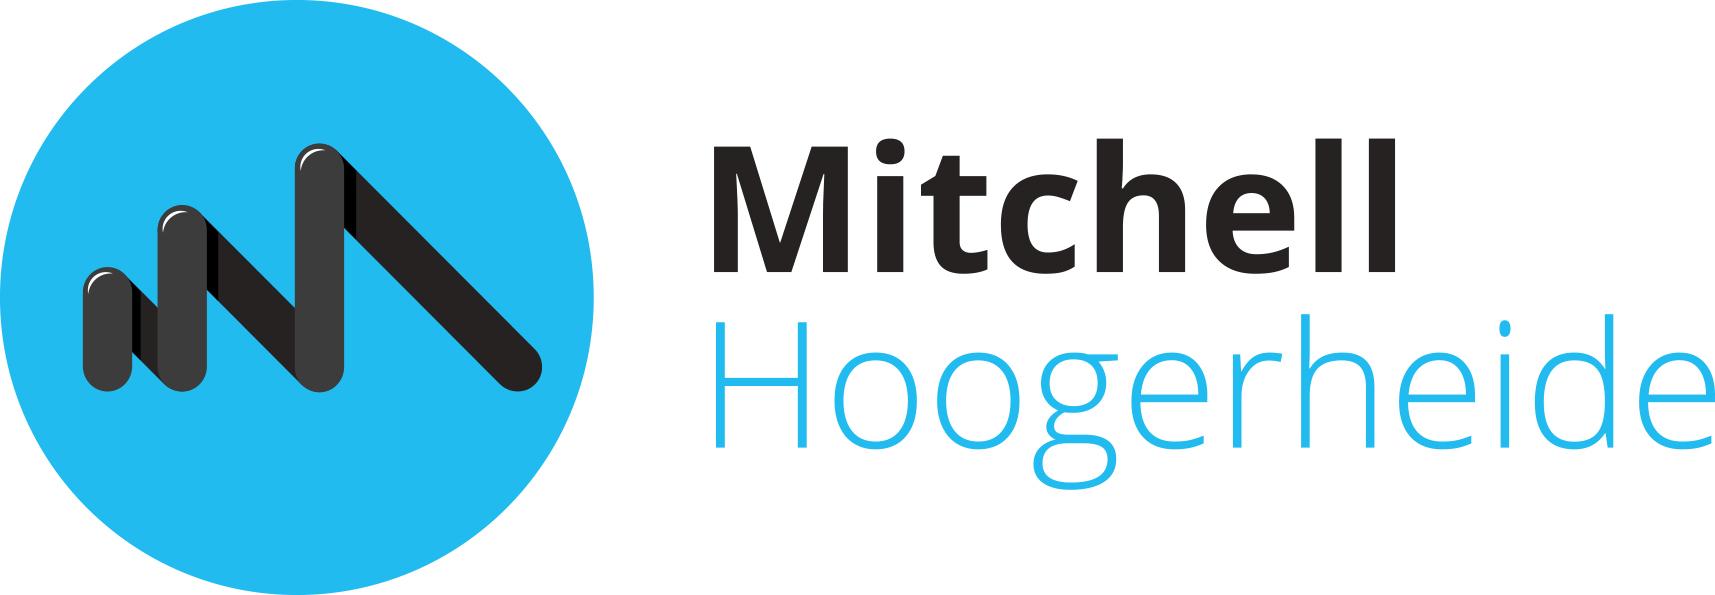 Mitchell Hoogerheide